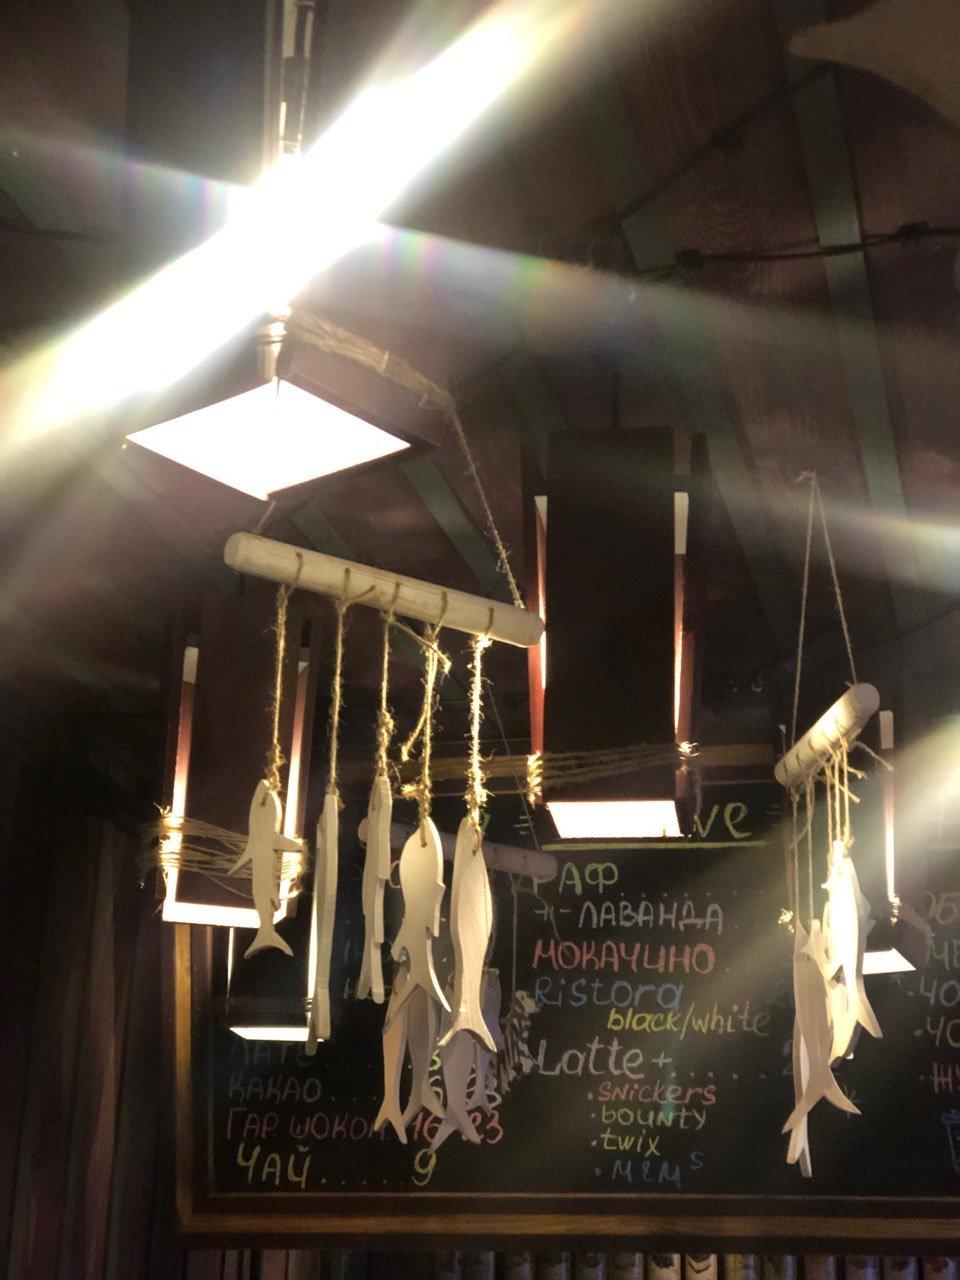 Кохання з присмаком кави: де у Хмельницькому провести День закоханих, фото-7